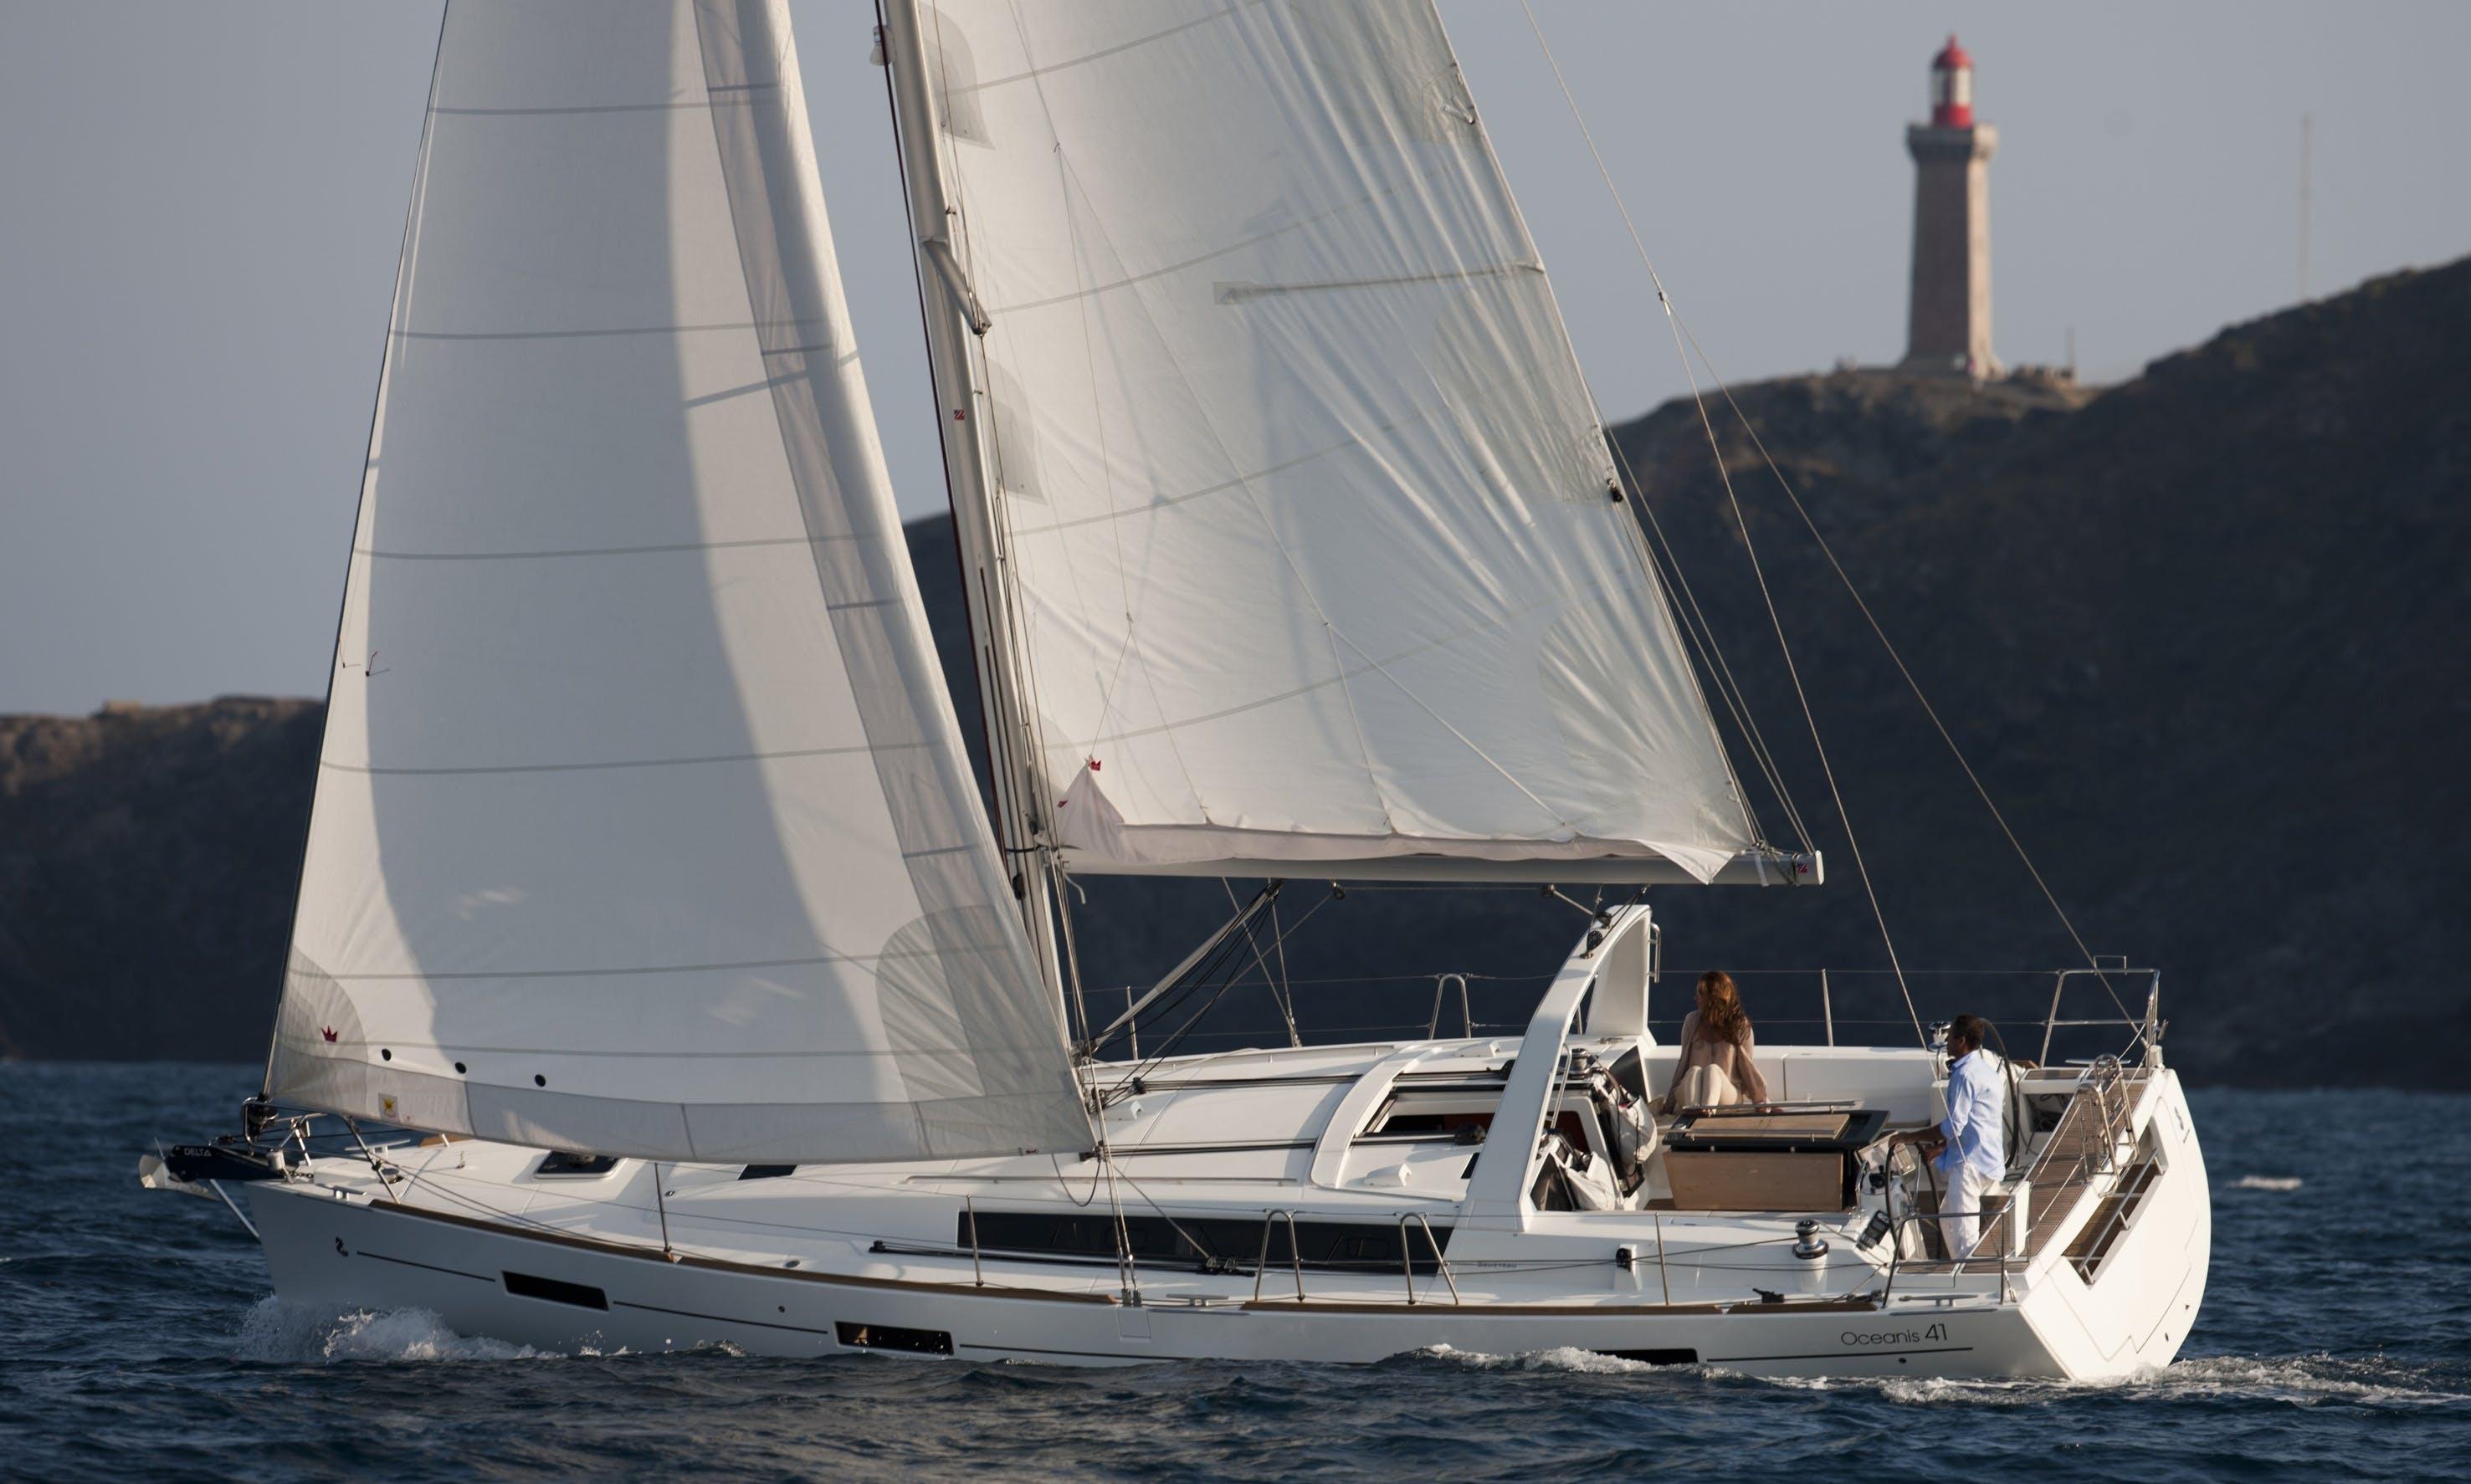 Experience Split, Croatia with this amazing Beneteau Oceanis Sailboat